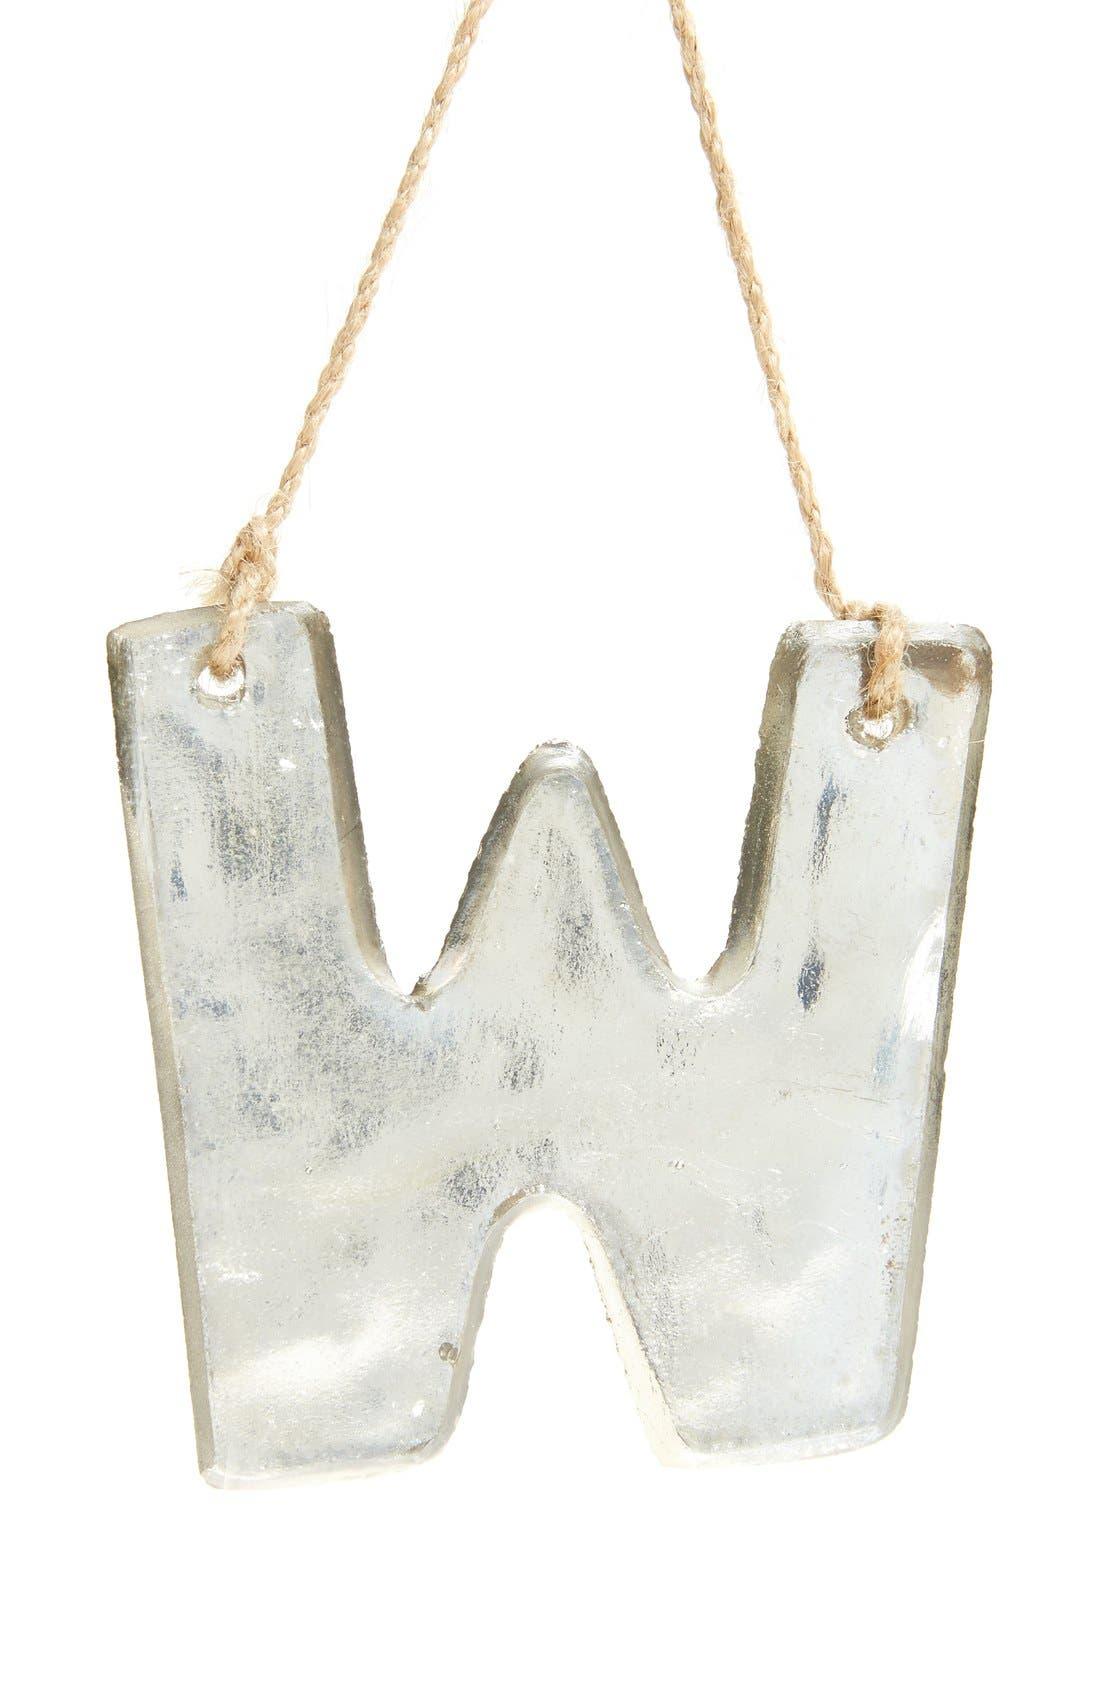 Nordstrom at Home Handblown Glass Alphabet Ornament